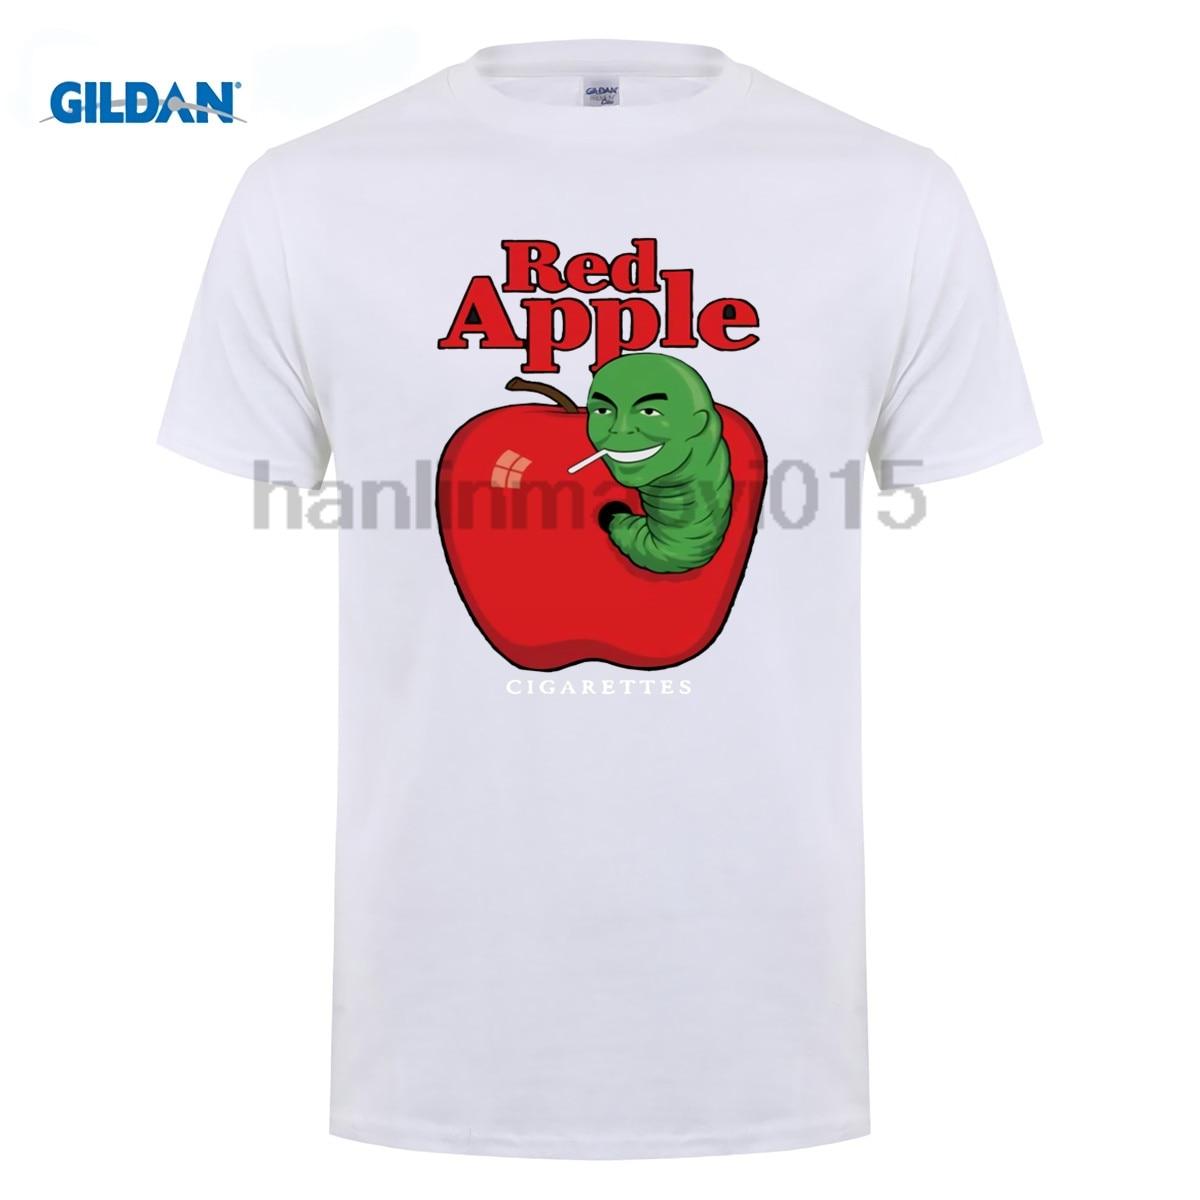 gildan-100-cotton-o-neck-printed-t-shirt-red-cigarettes-t-shirt-font-b-tarantino-b-font-fake-brand